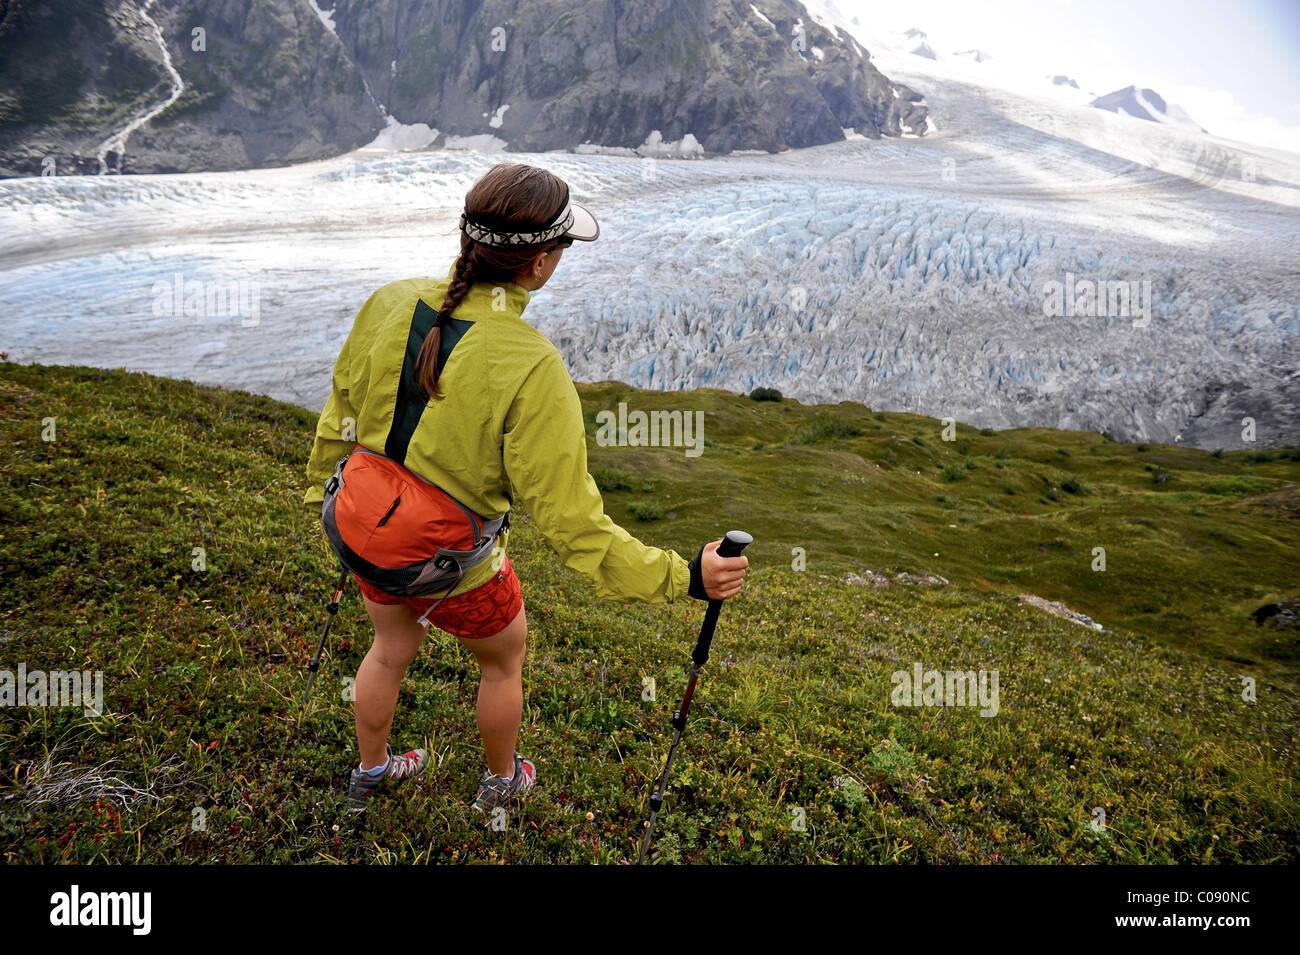 Woman hiking  Exit Glacier in the Harding Icefield, Kenai Fjords National Park, Kenai Peninsula, Southcentral Alaska Stock Photo